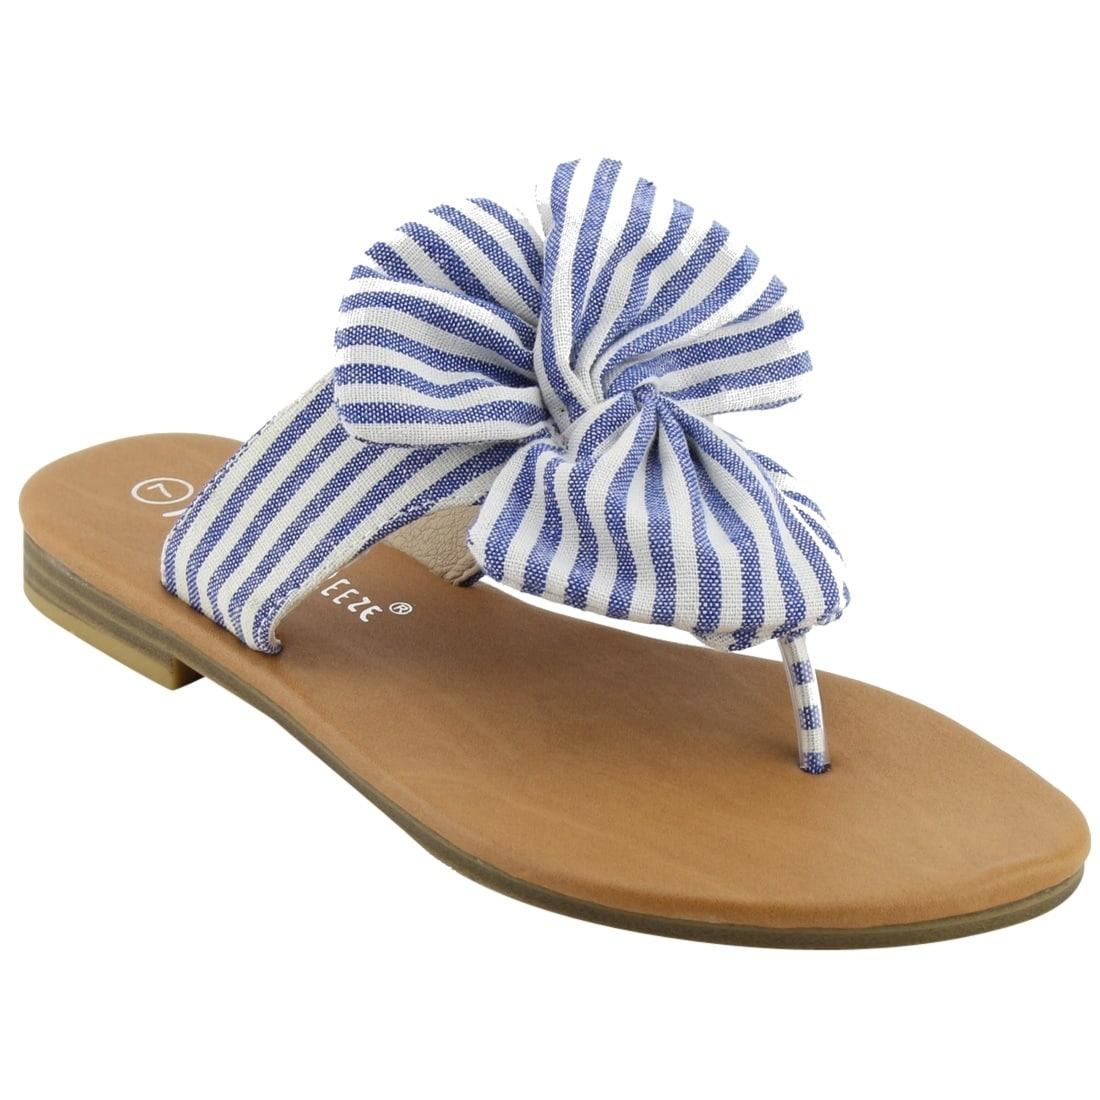 c3402cf7184f Shop NATURE BREEZE EM13 Women s Striped Bow Thong Flip Flop Flat ...